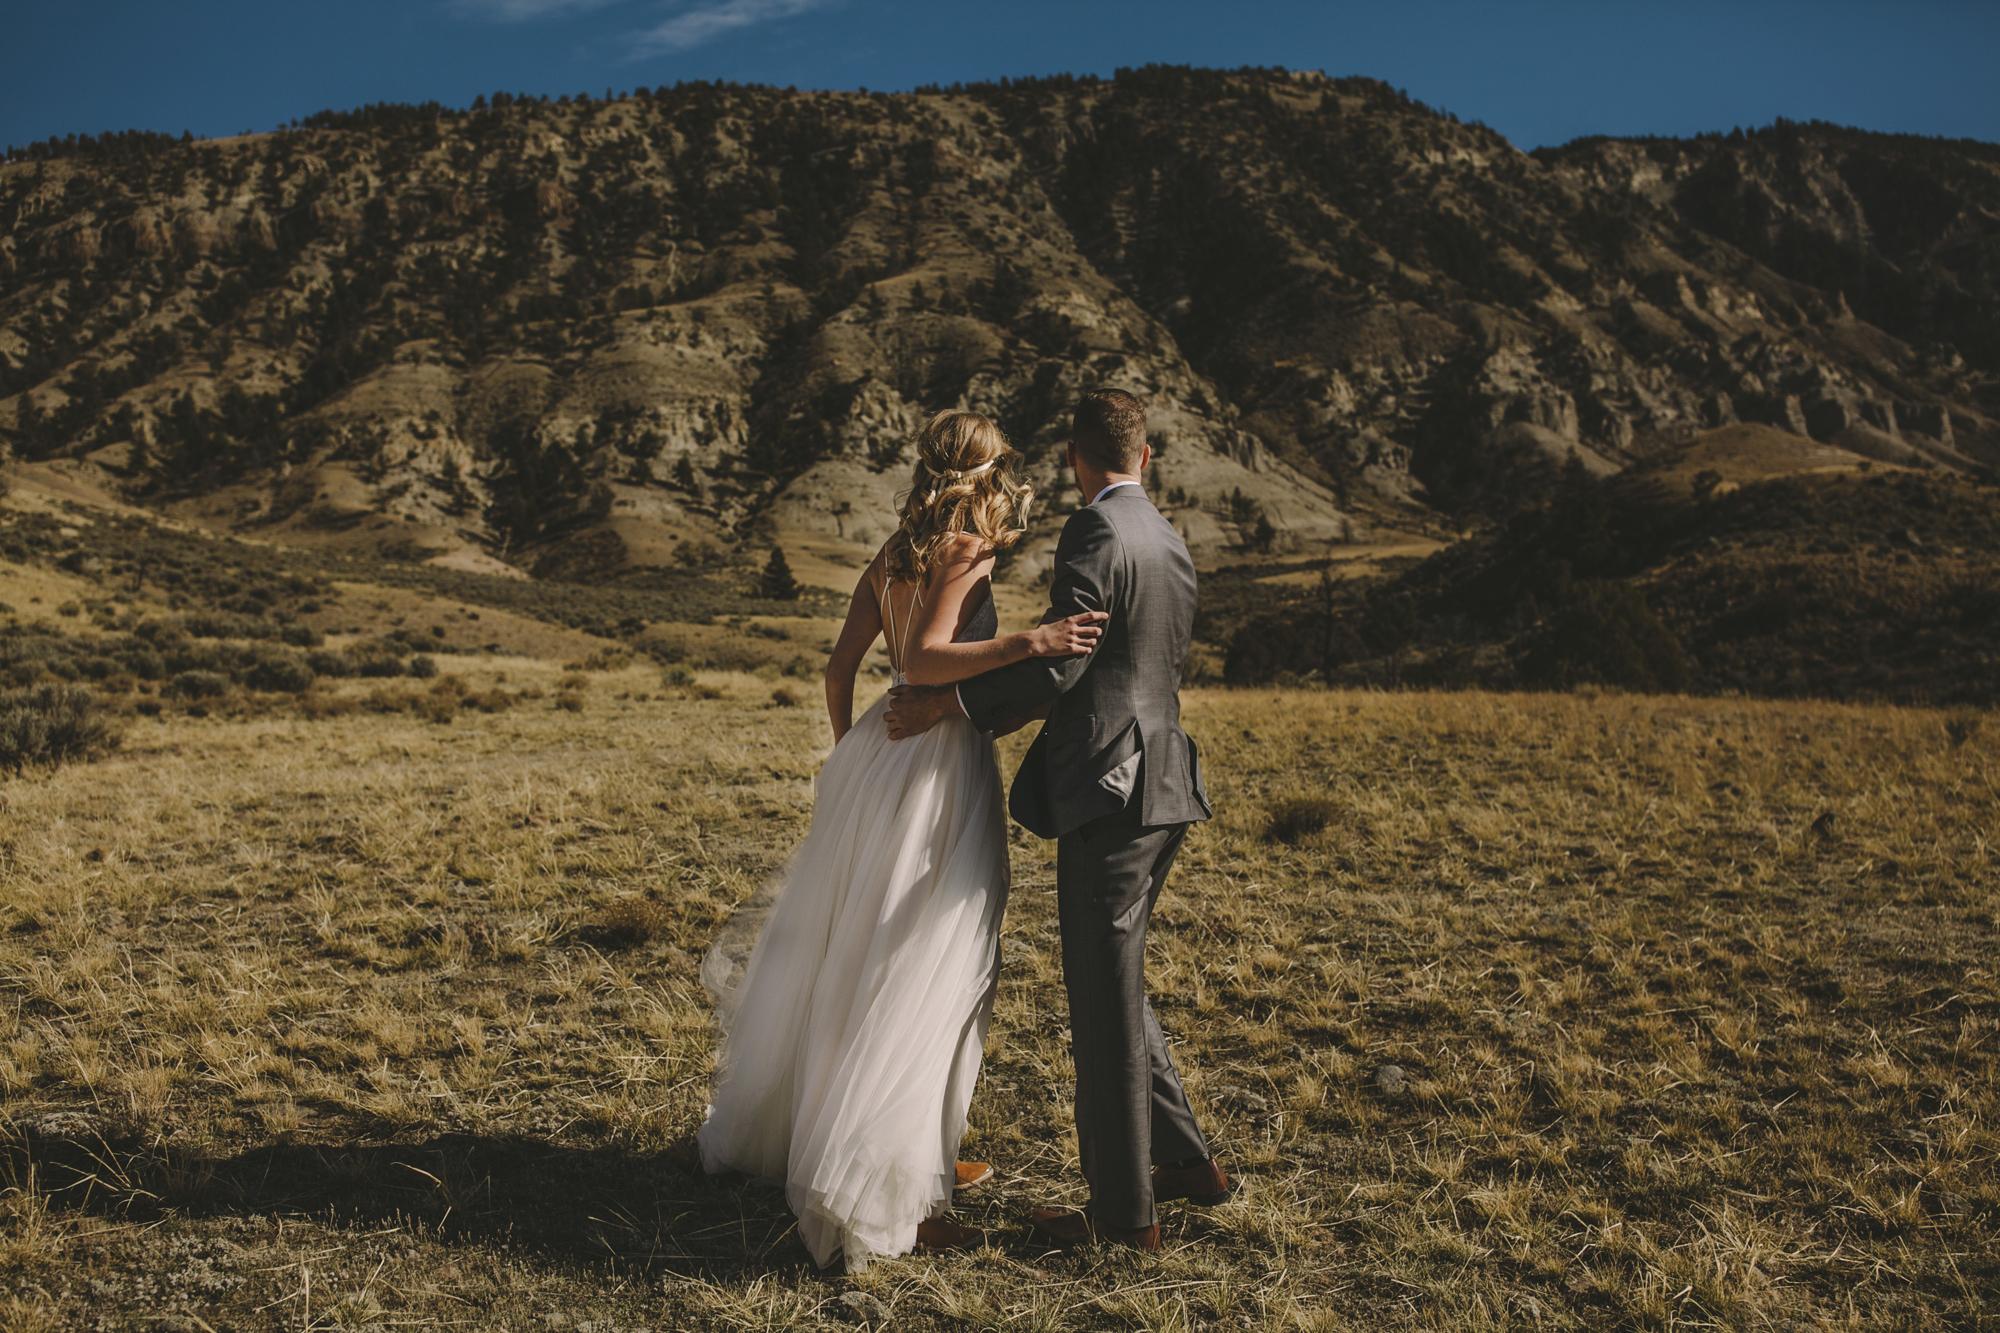 yellowstone national park wedding photographer brandon werth chico hot springs montana